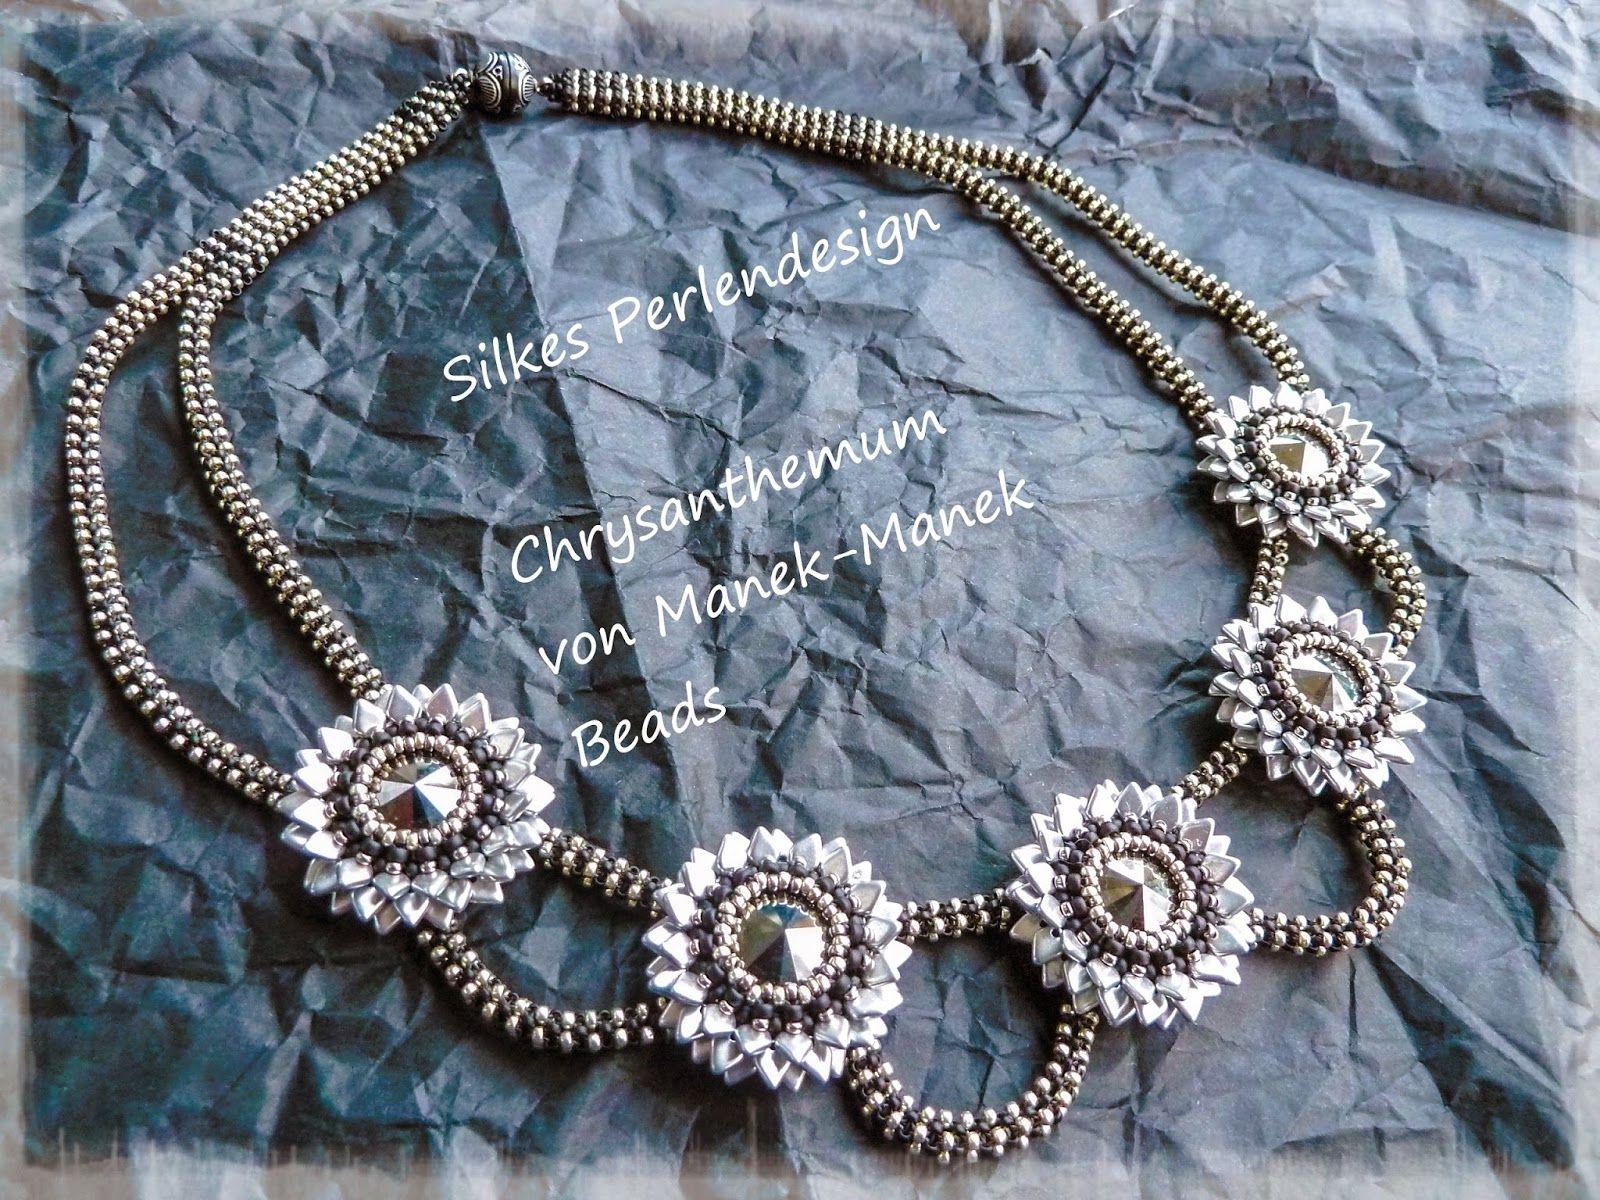 http://silkes-perlendesign.blogspot.de/search?updated-max=2015-05-16T19:42:00+02:00